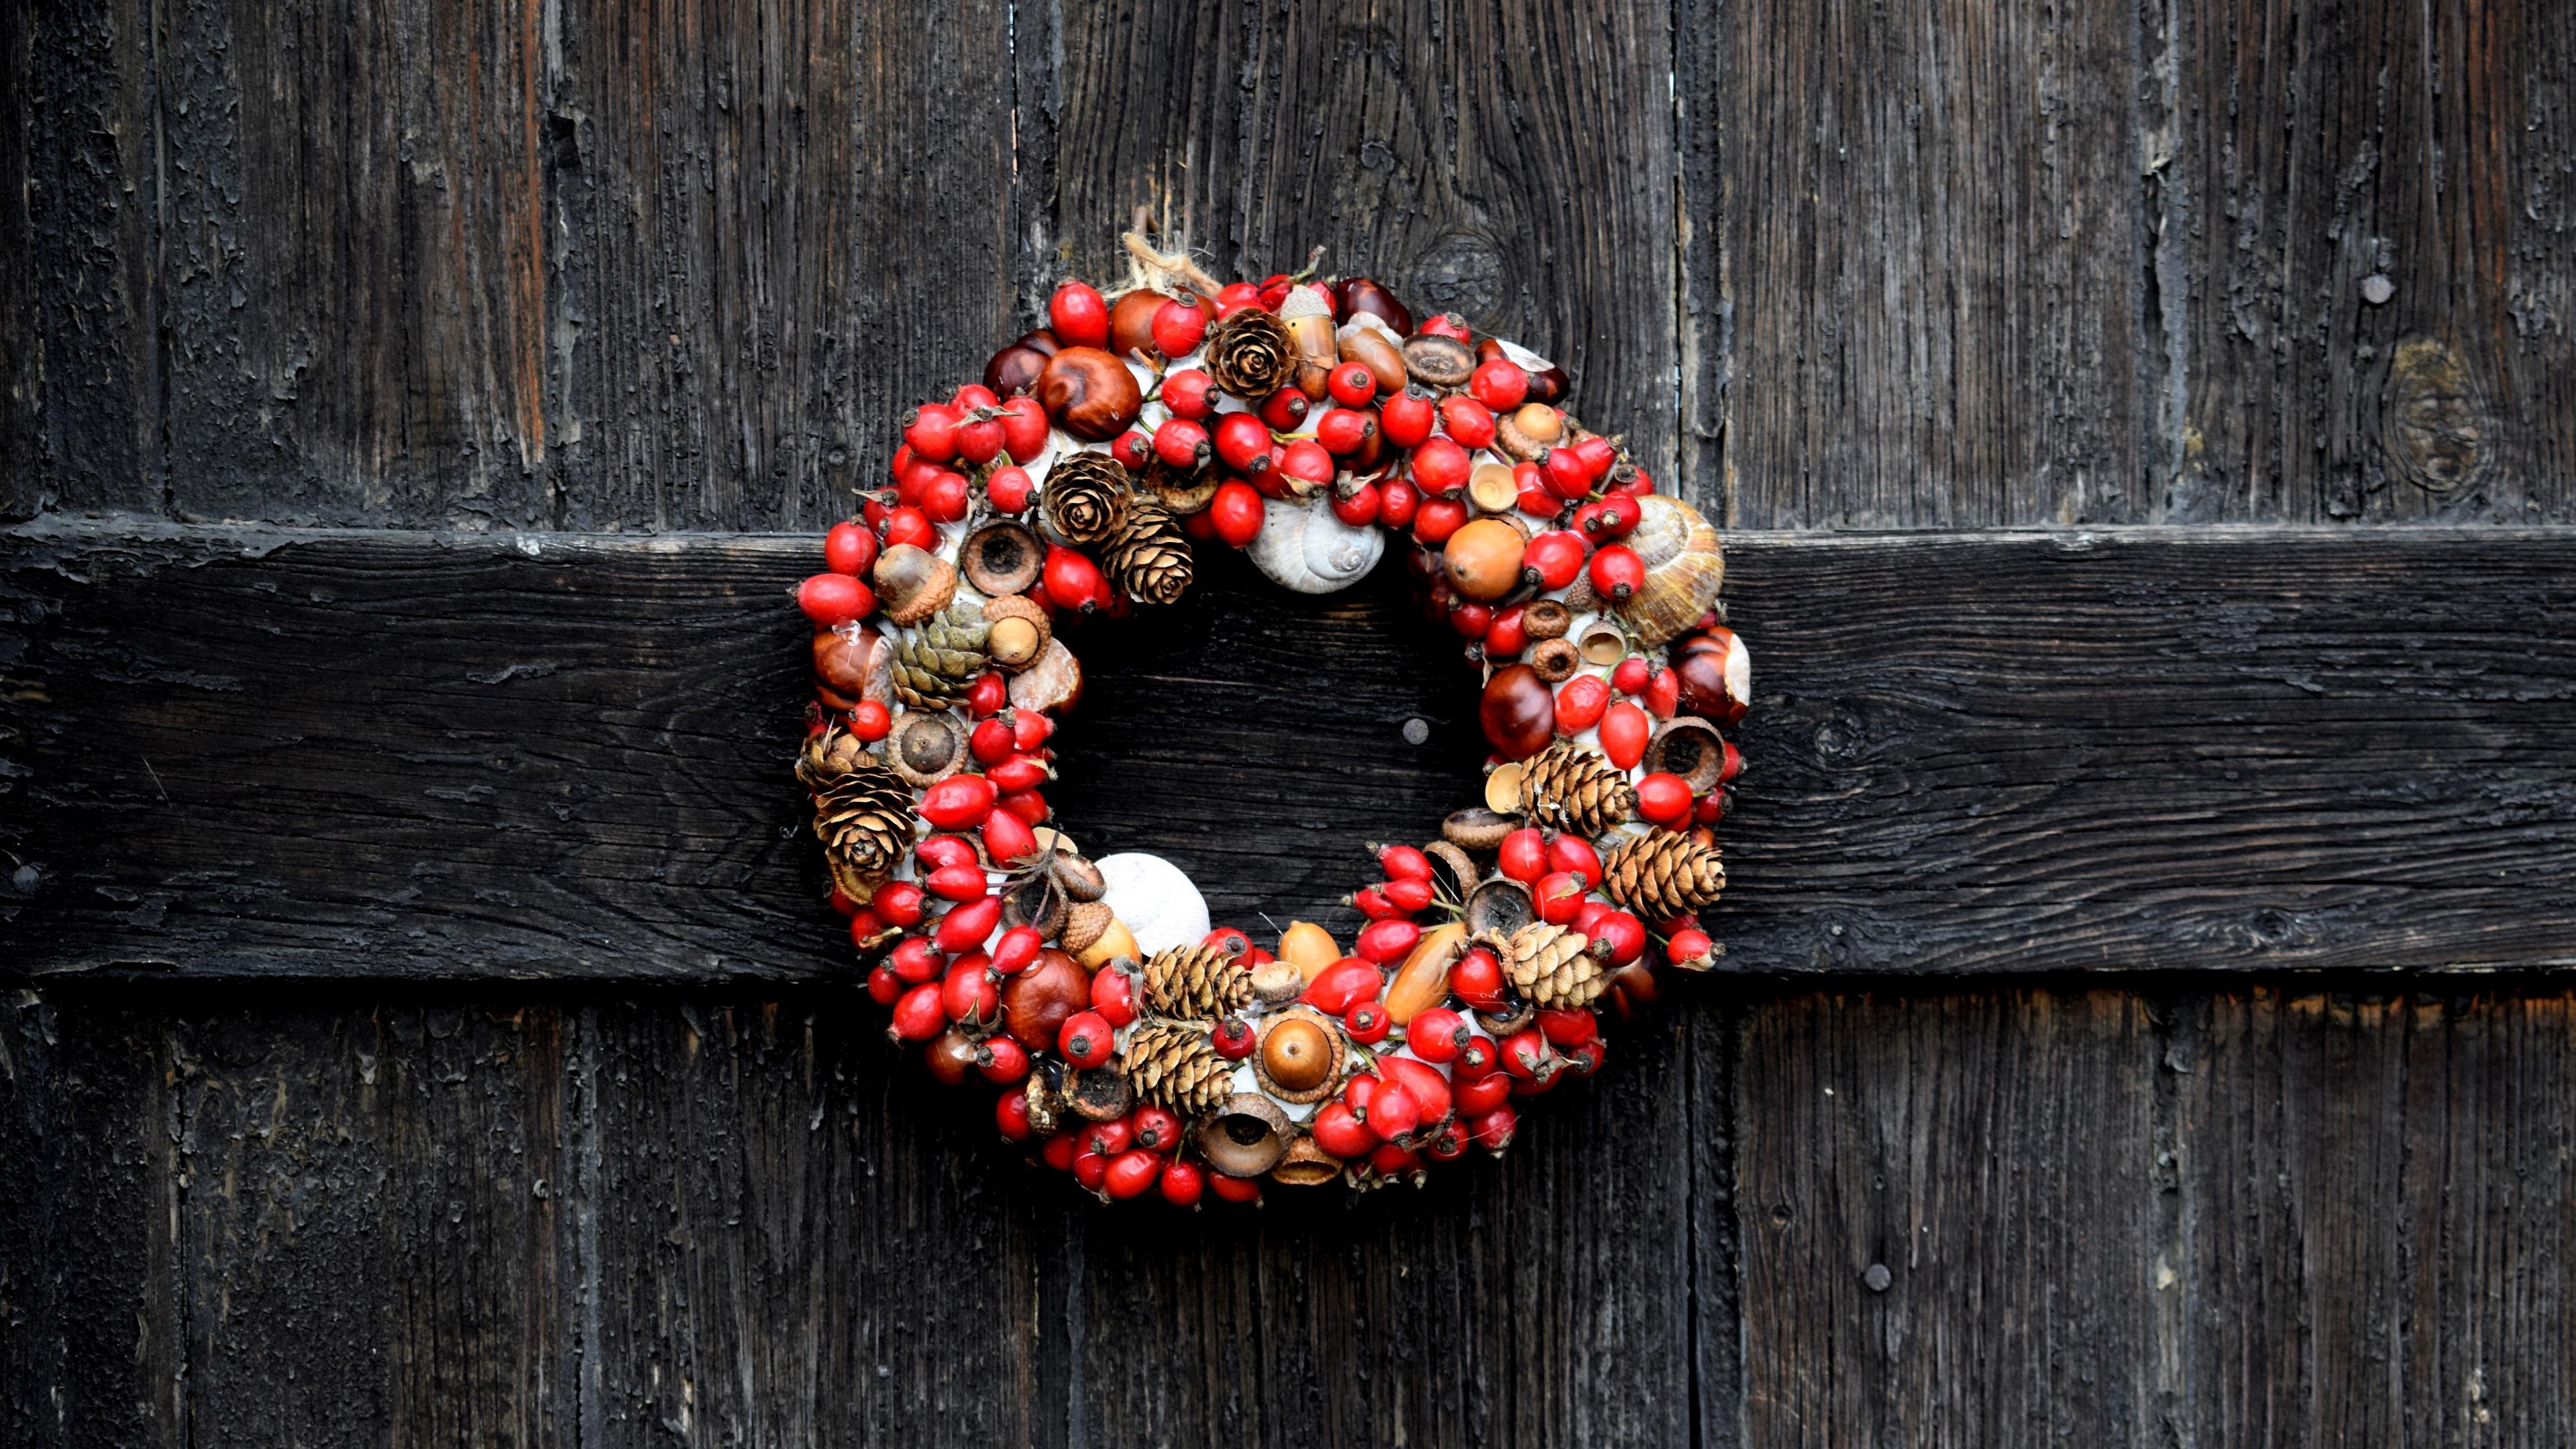 wreath christmas dogrose acorns cones 4k 1538345085 - wreath, christmas, dogrose, acorns, cones 4k - wreath, dogrose, Christmas